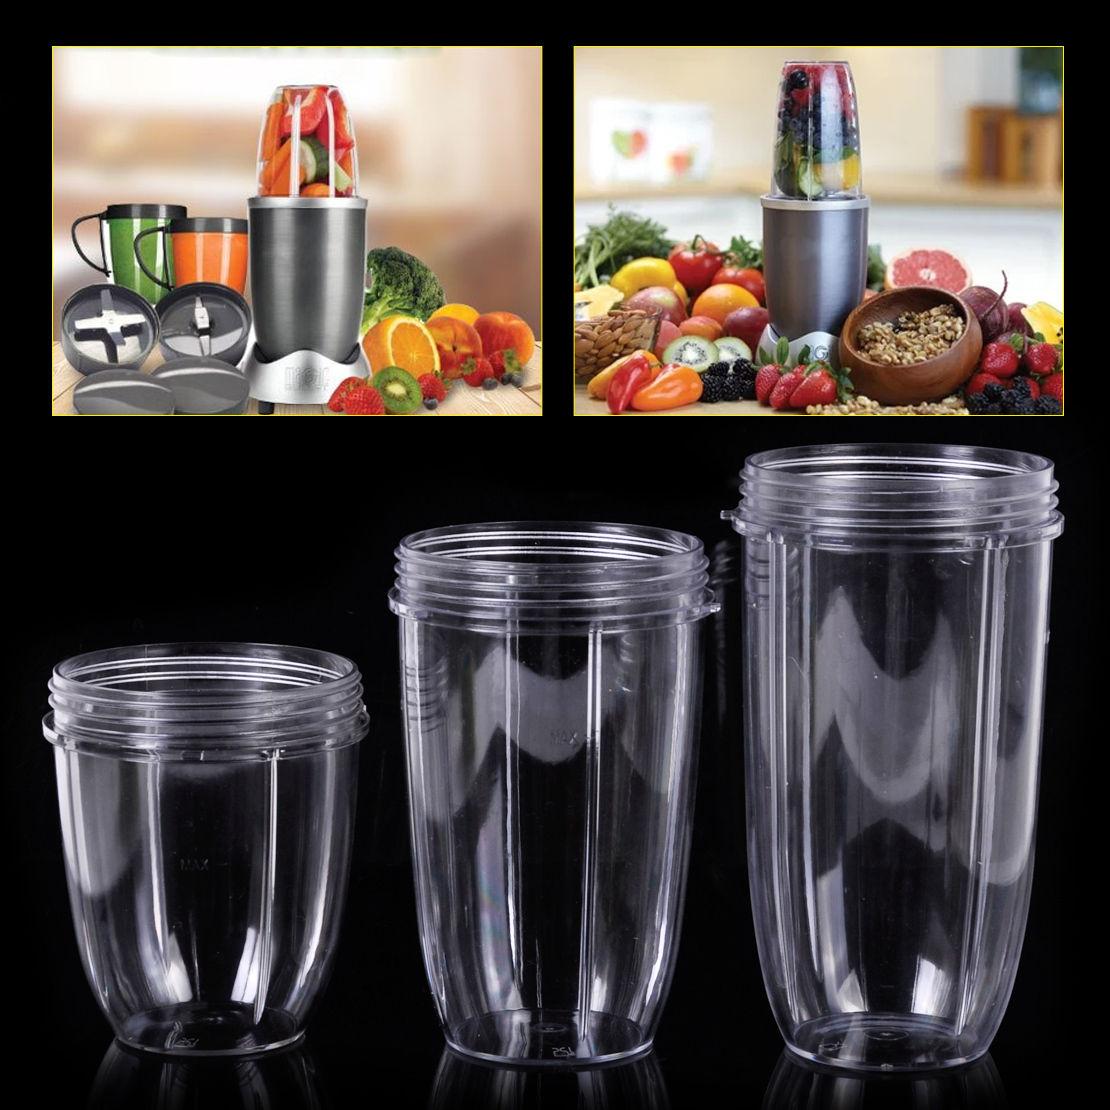 Hot Sale 18/24/32OZ Magic Juicer Part Mug Fruit Squeezer Cup Accessory For Nutribullet New Arrival